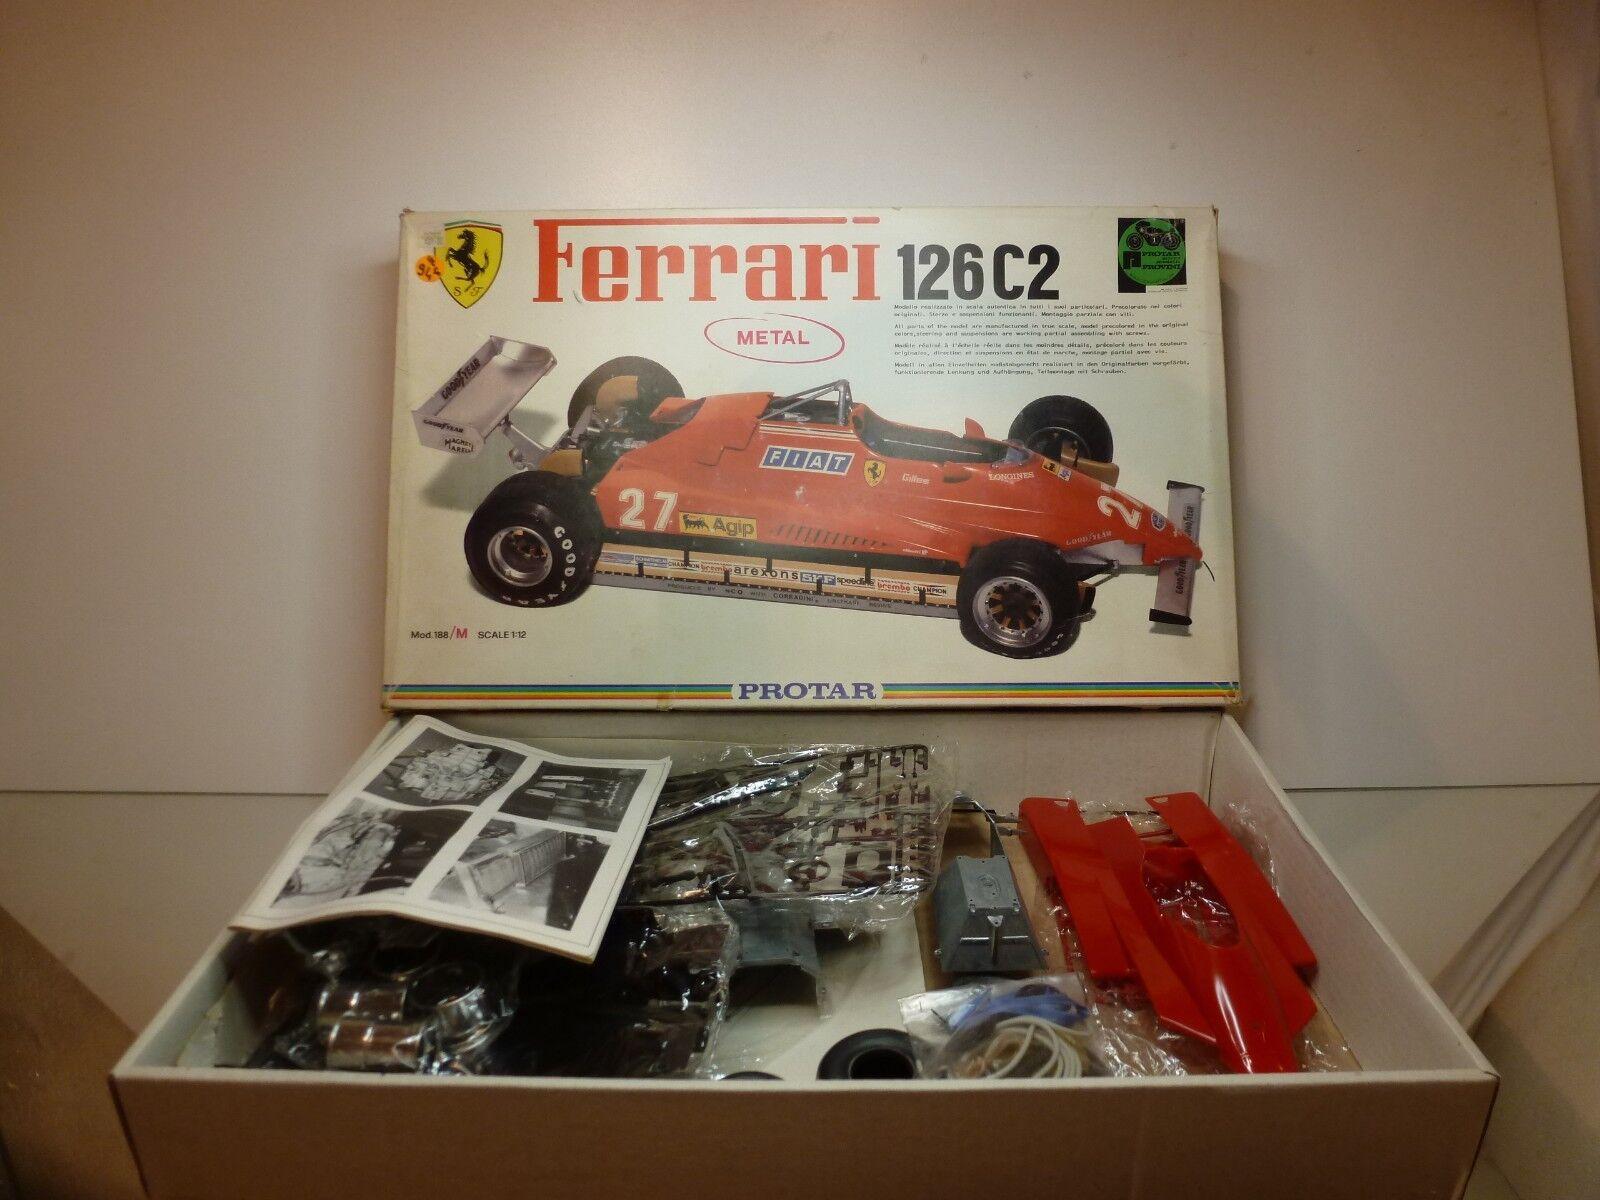 PredAR metal 188 FERRARI 126C2 - F1 RED 1 12 - UNBUILT CONDITION IN BOX